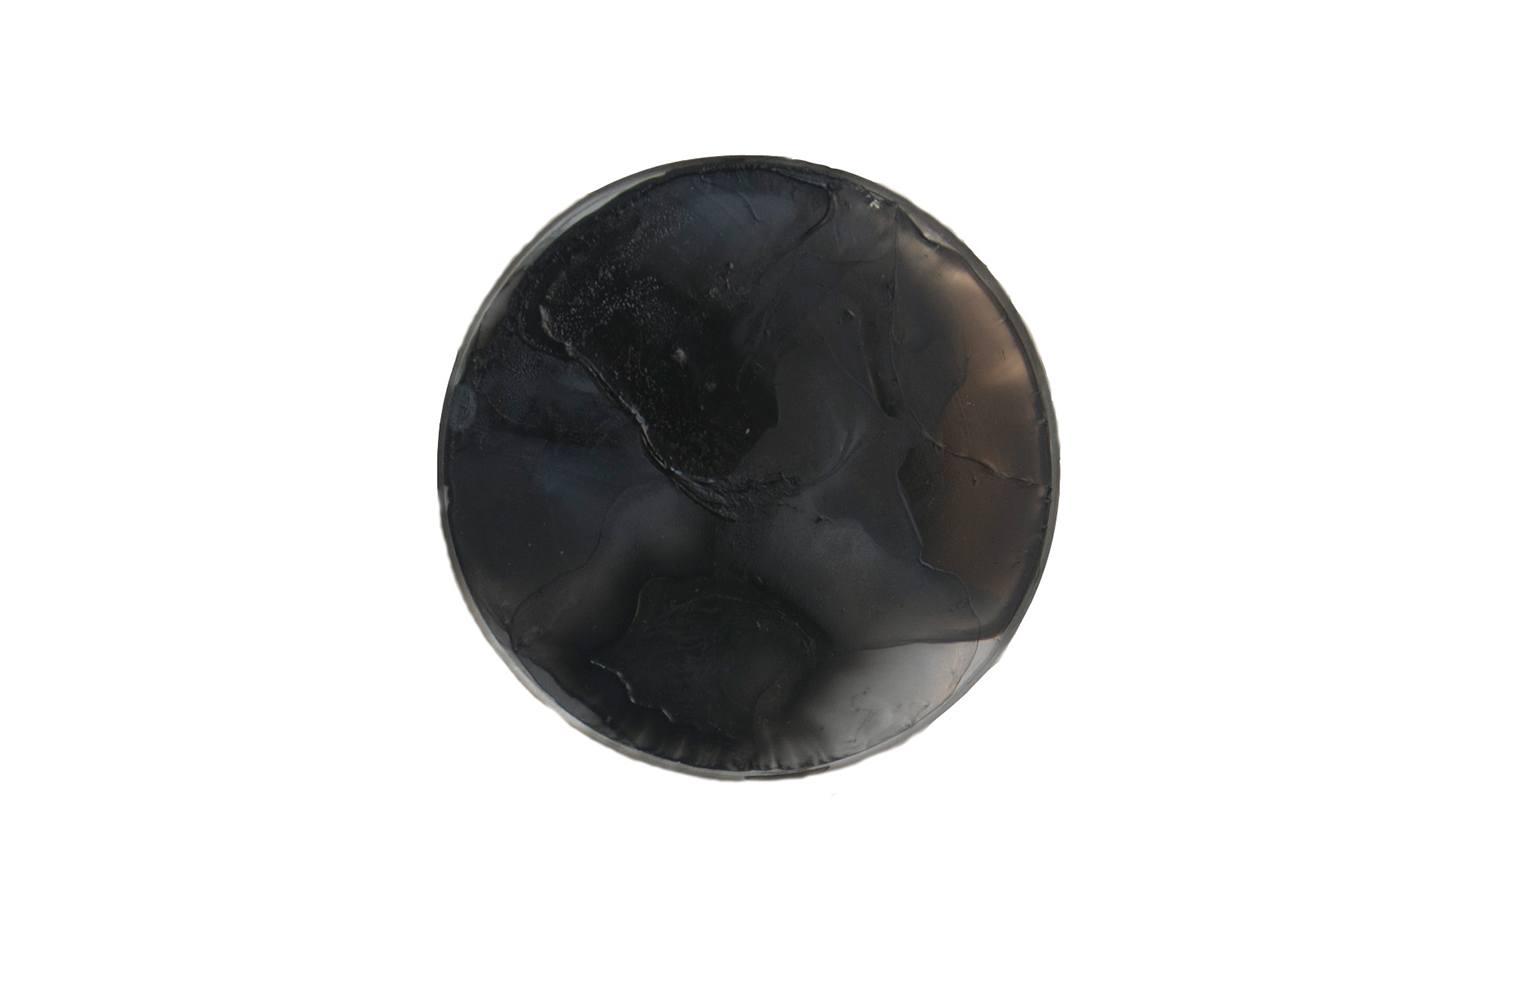 Flattened Sphere #5